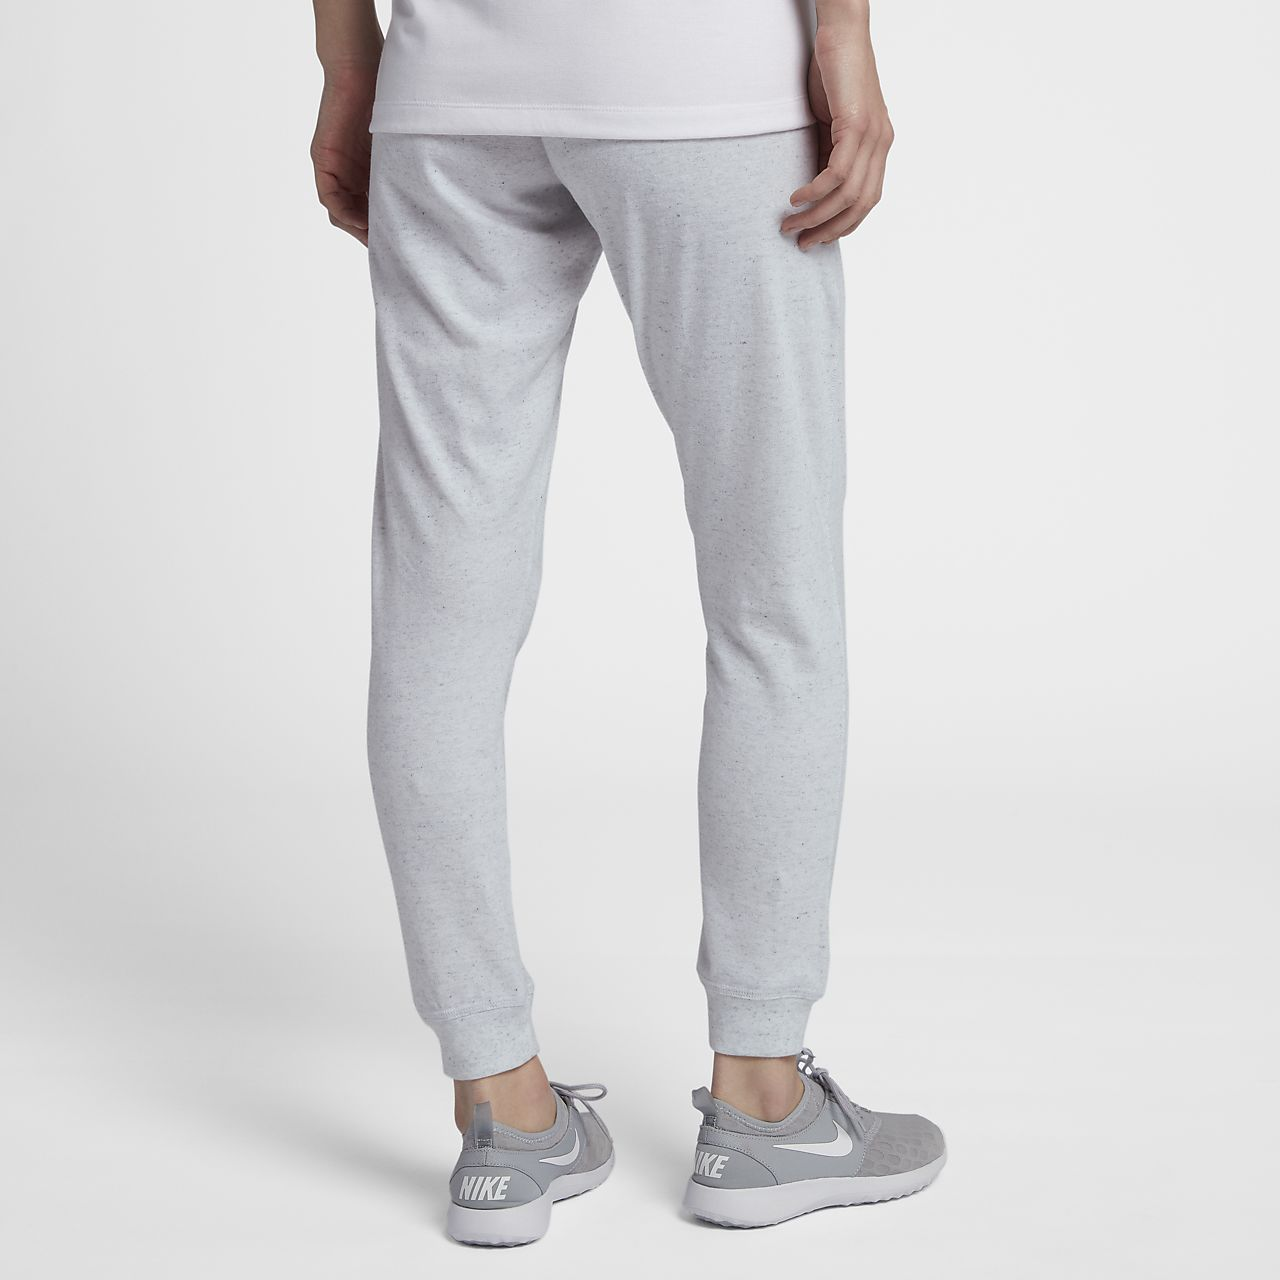 pantalon femme nike vintage